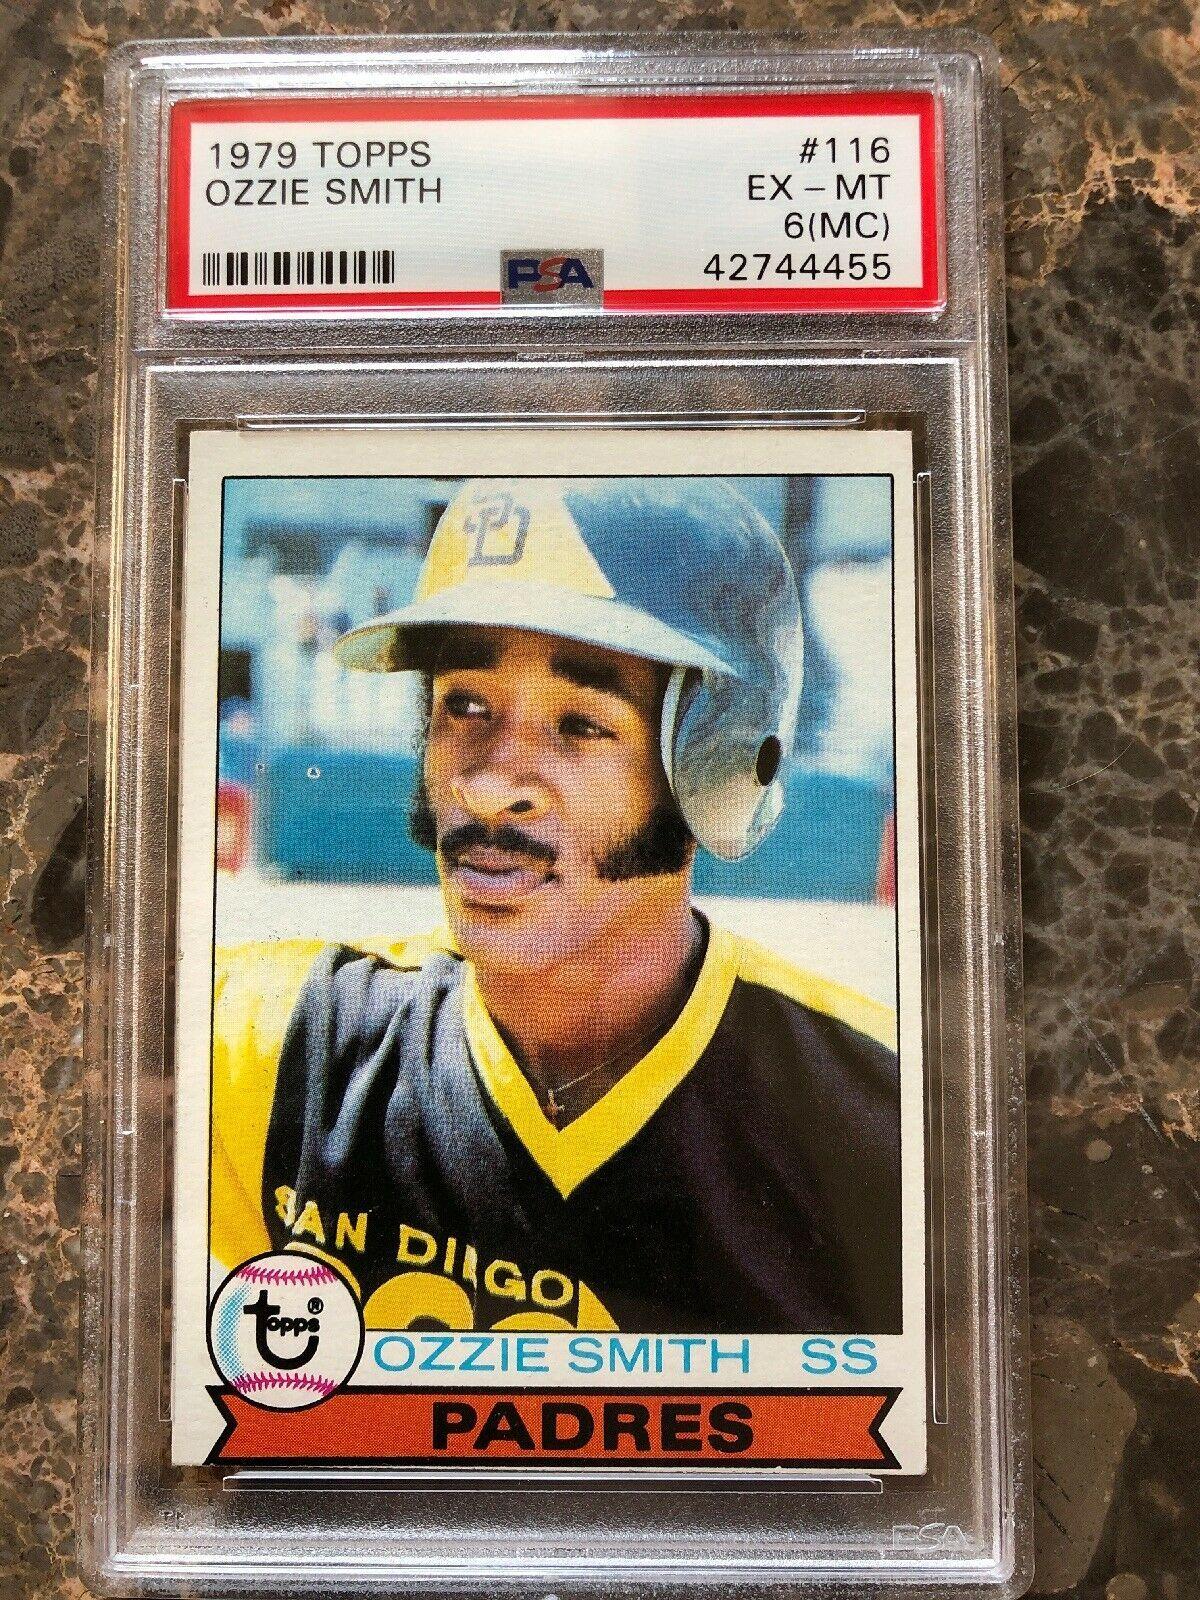 Ozzie Smith 1979 Topps 116 Psa 6 Rookie Card Mc Miss Cut